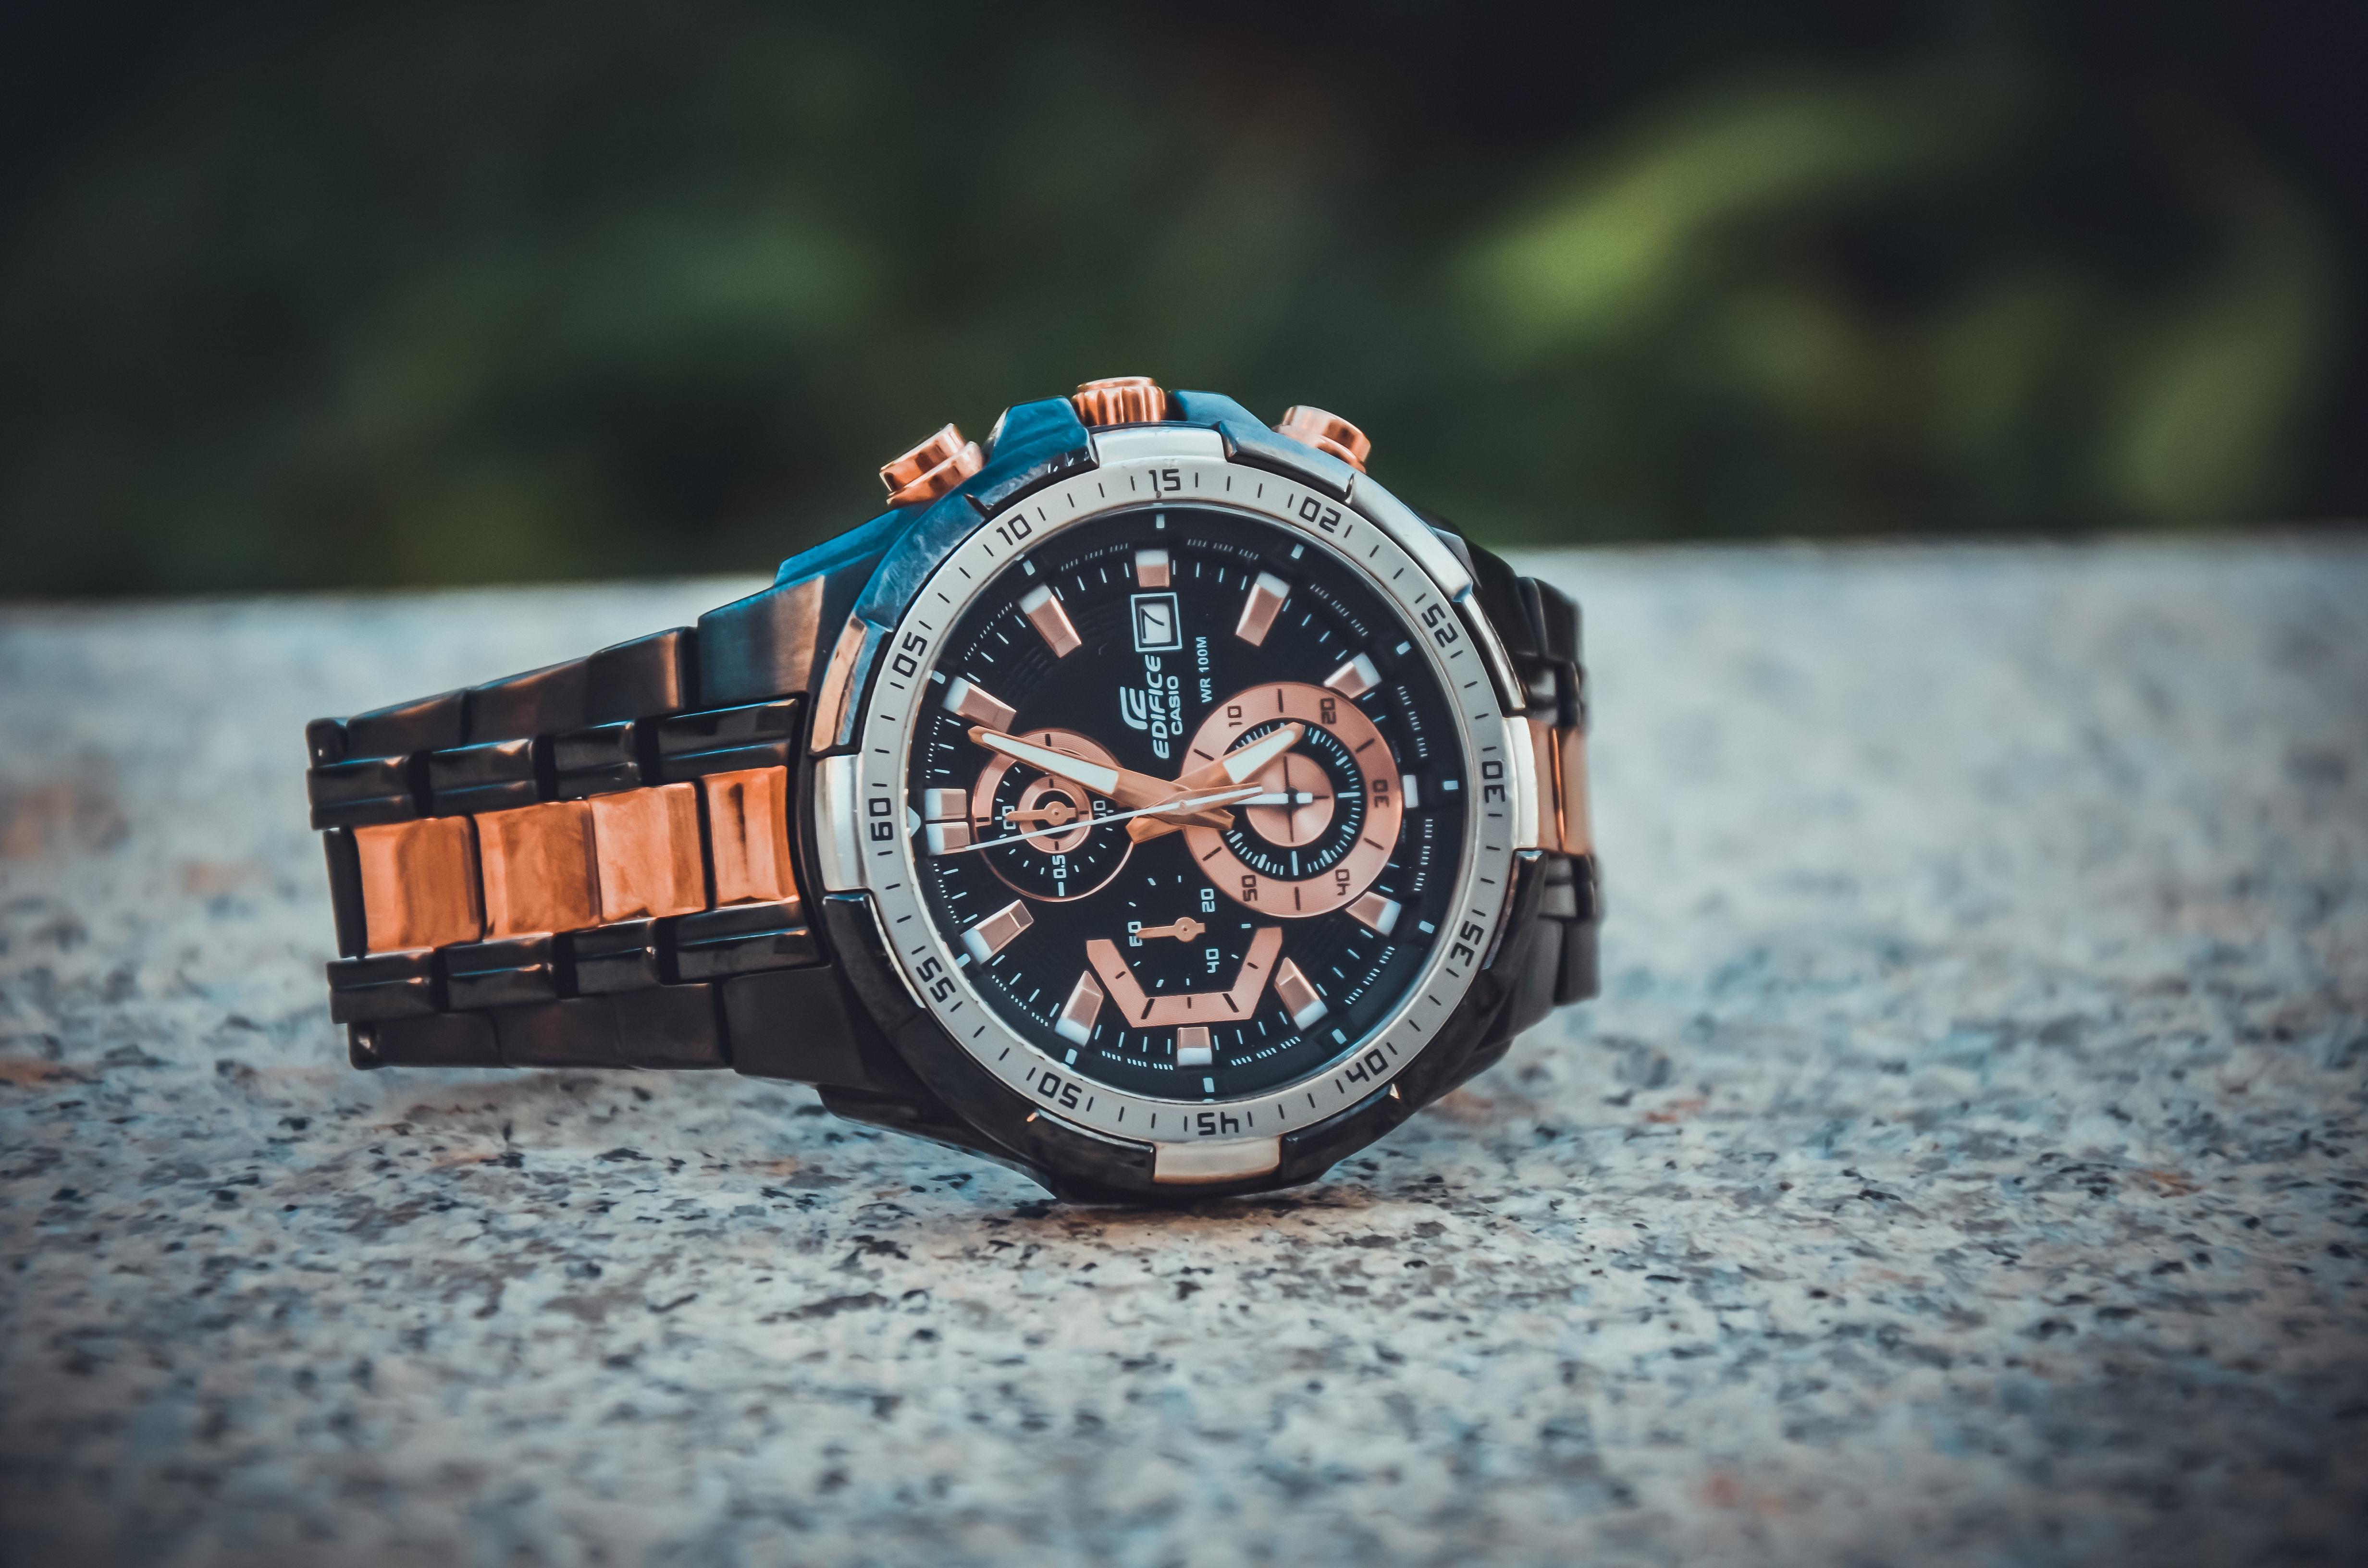 Close-Up Photo of Wristwatch